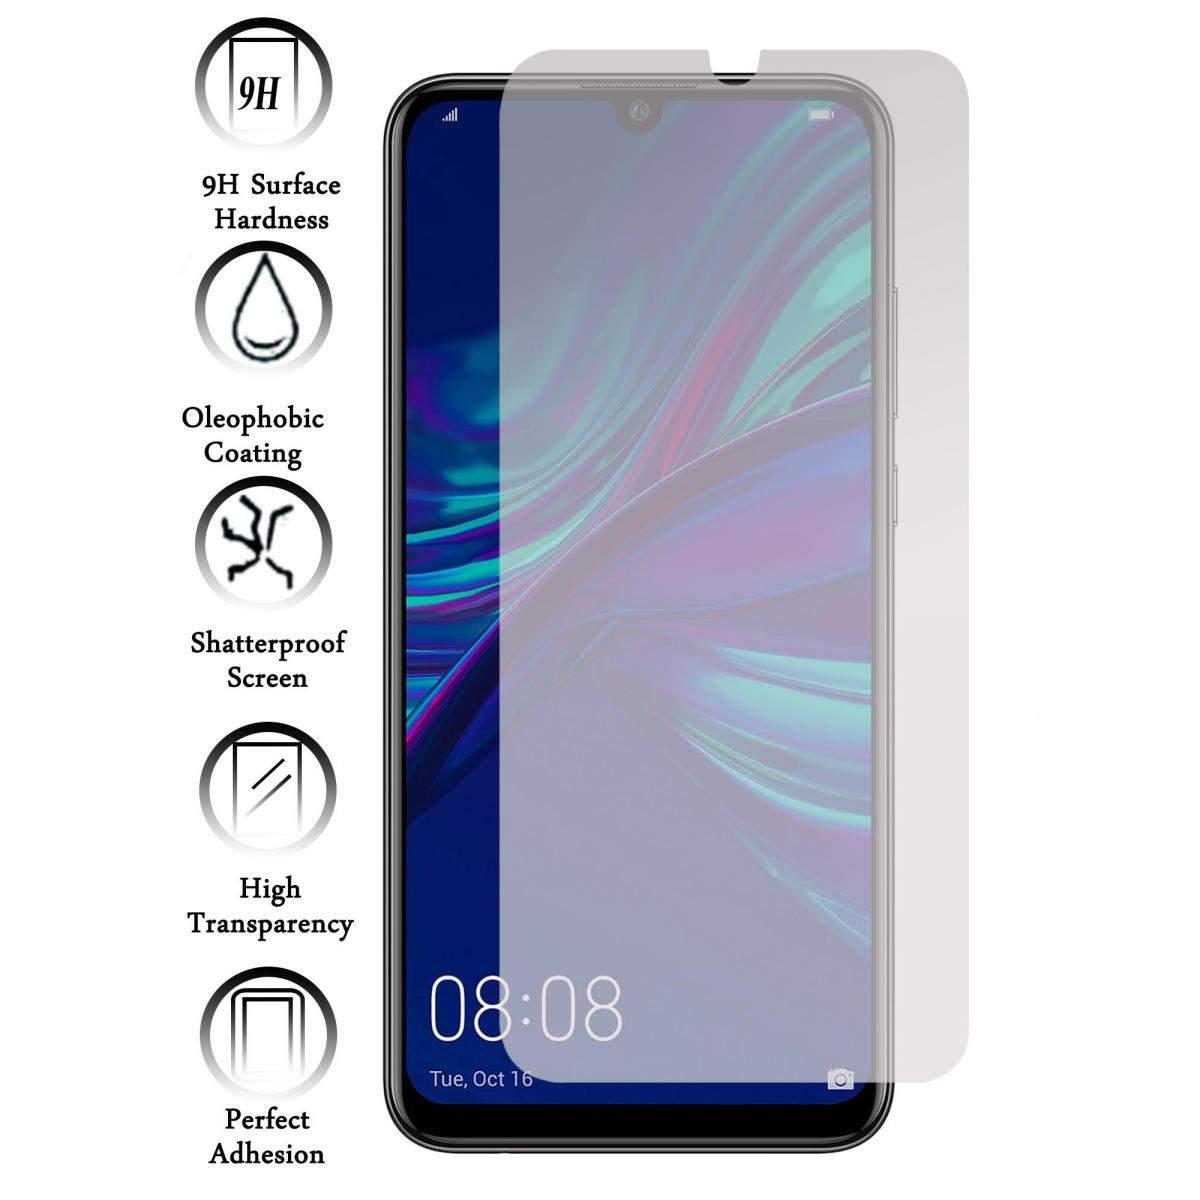 Kit-Protector-de-Pantalla-Cristal-Templado-Vidrio-para-Huawei-P-Smart-2019